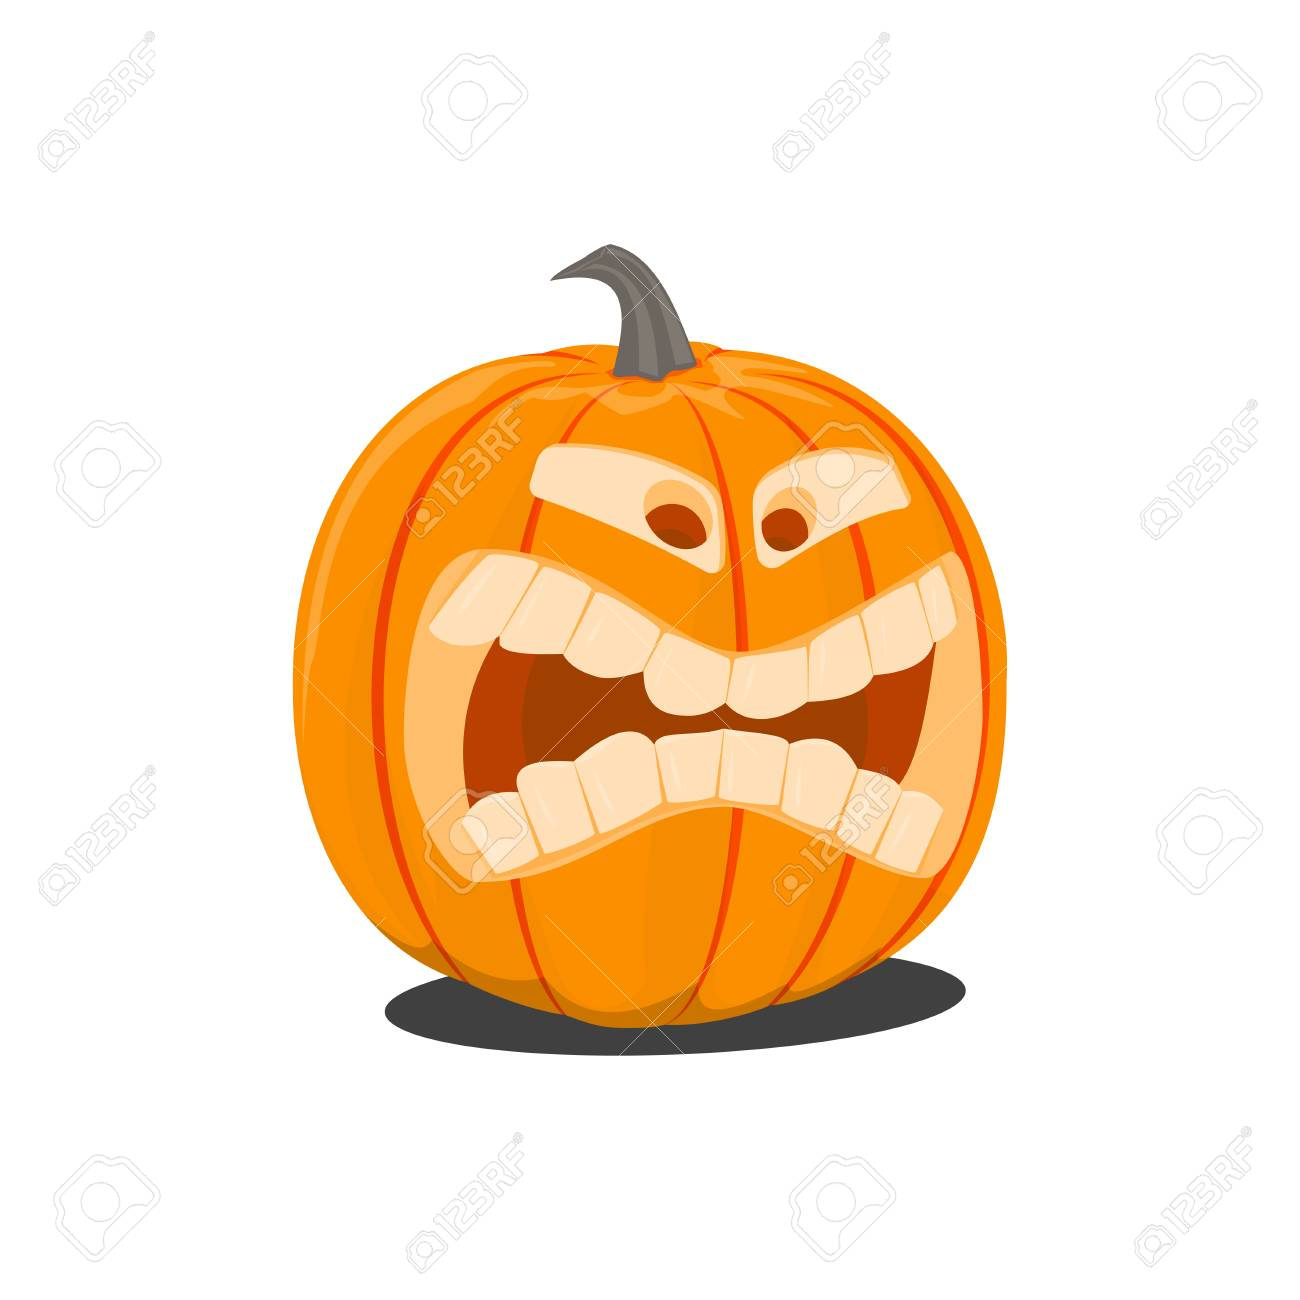 Vector Color Illustration Of Cartoon Halloween Pumpkin With Face